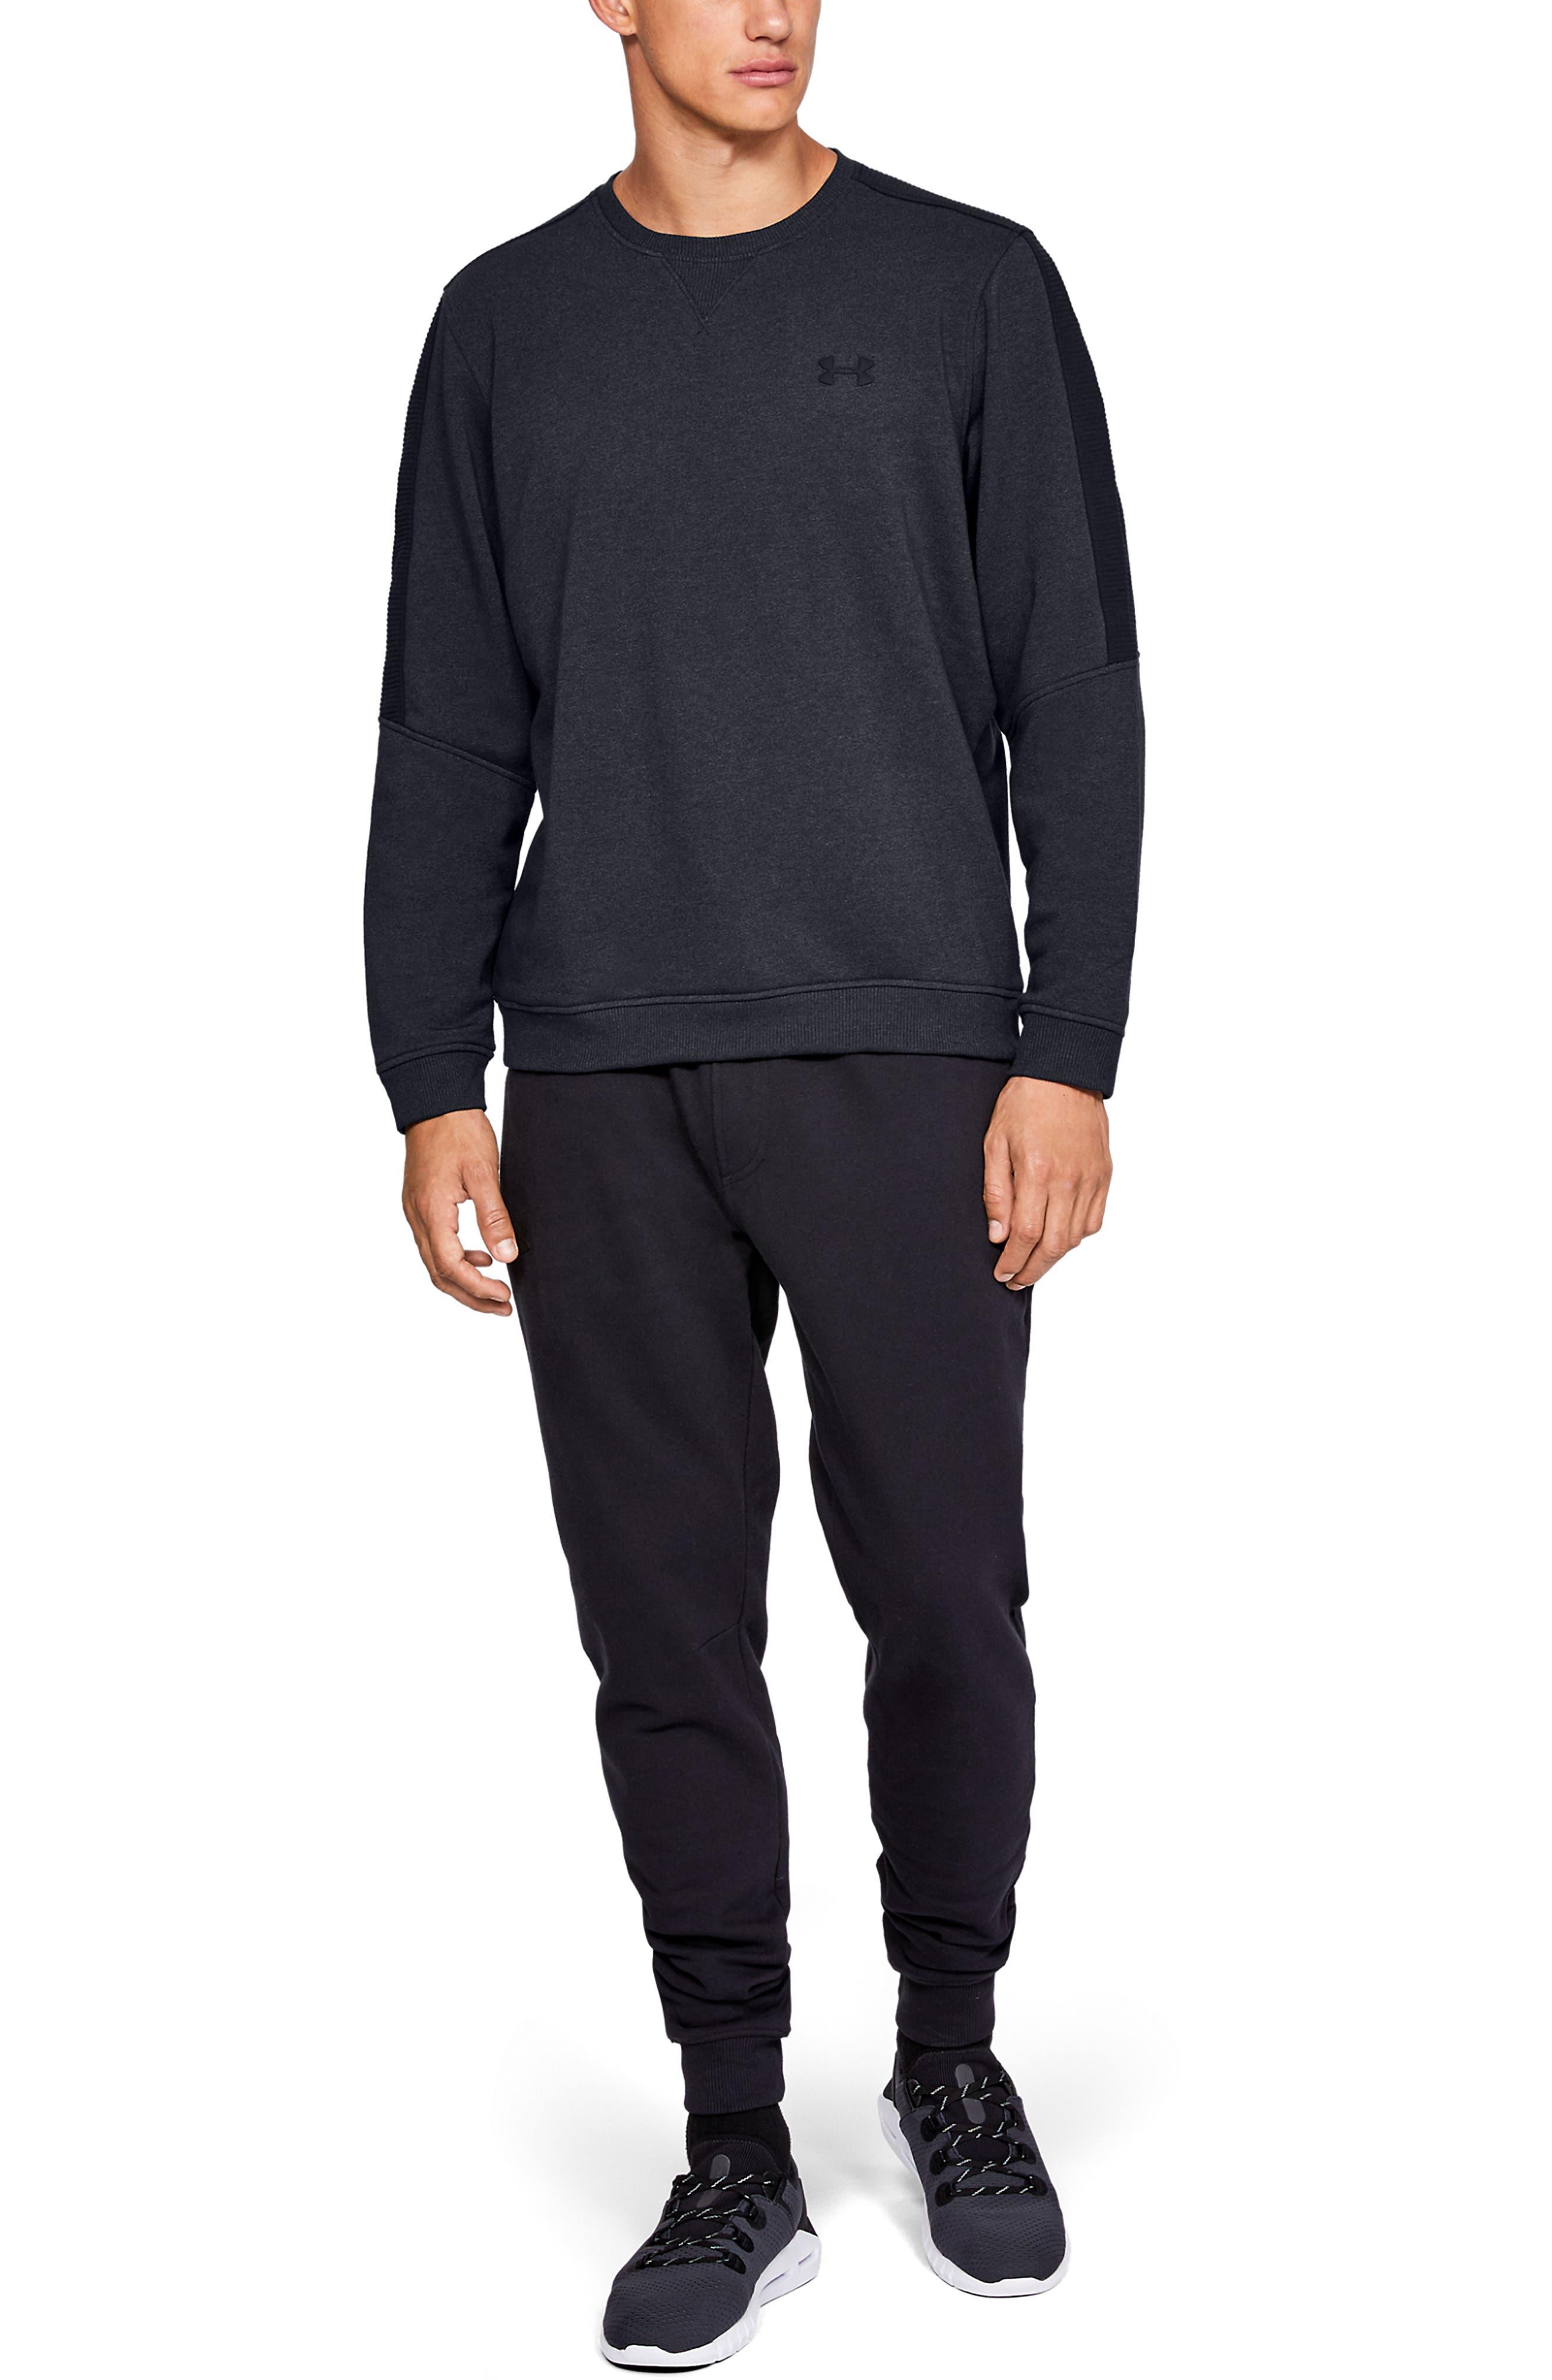 Threadborne Siro Fleece Crewneck Sweatshirt,                             Alternate thumbnail 5, color,                             BLACK/ BLACK/ BLACK